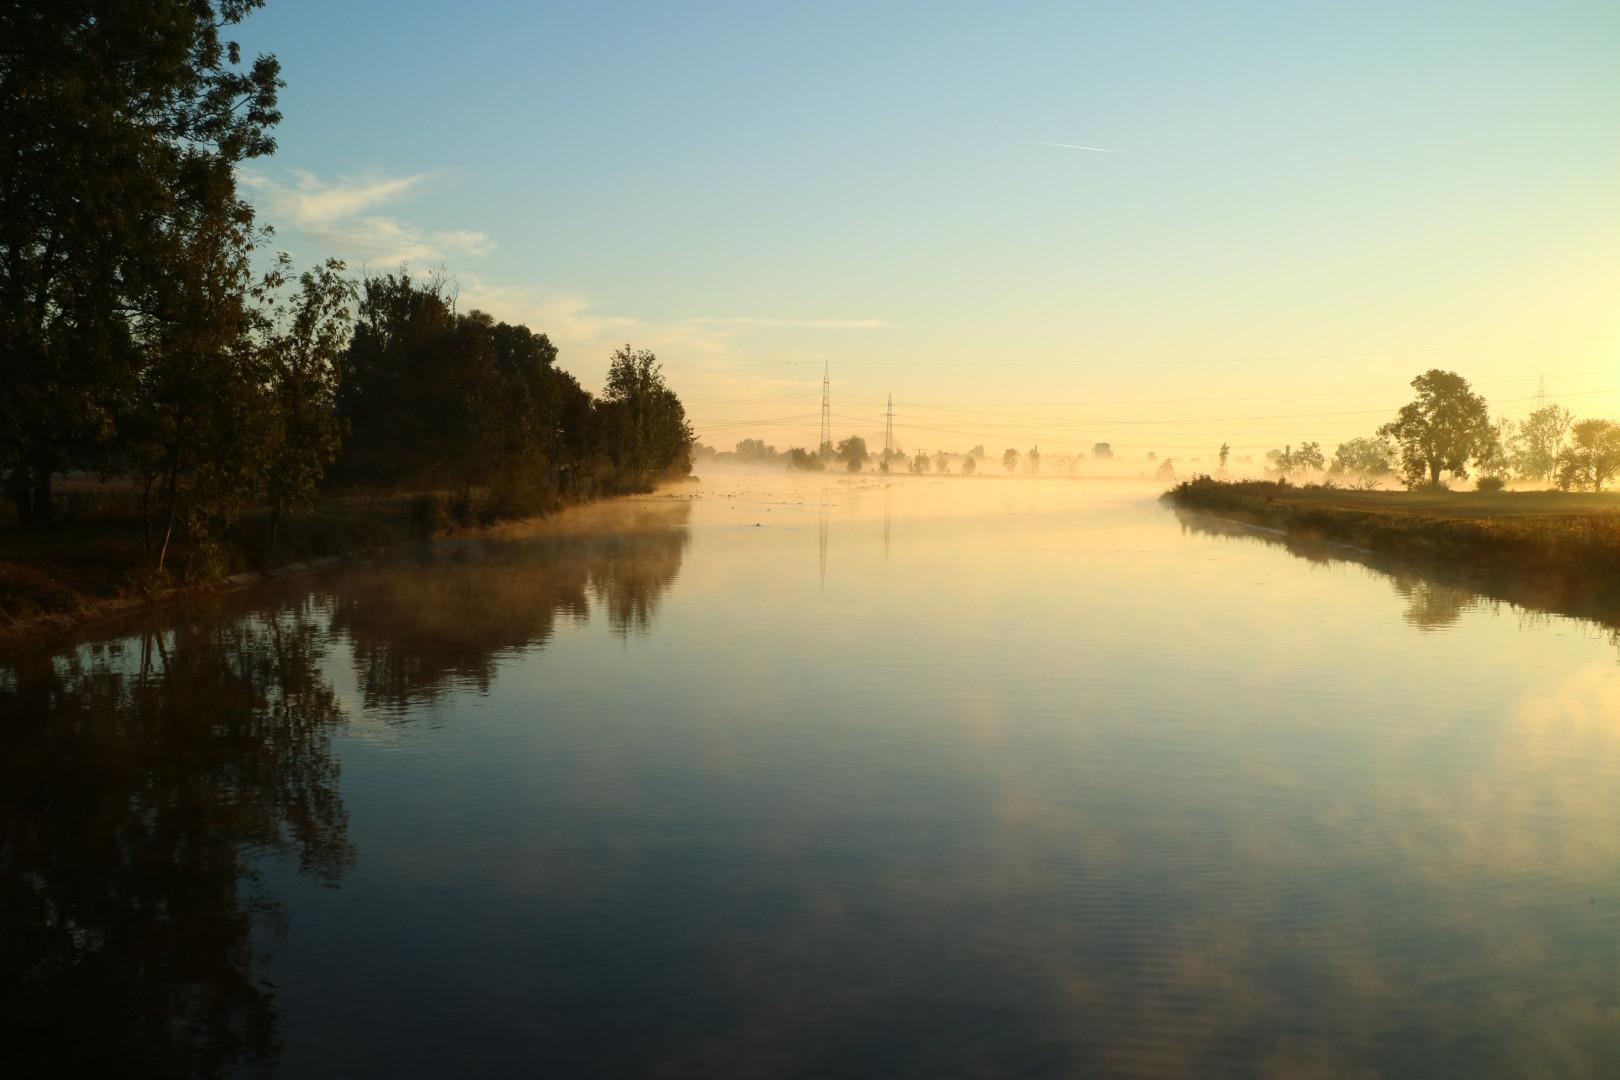 rising mist and rising sun